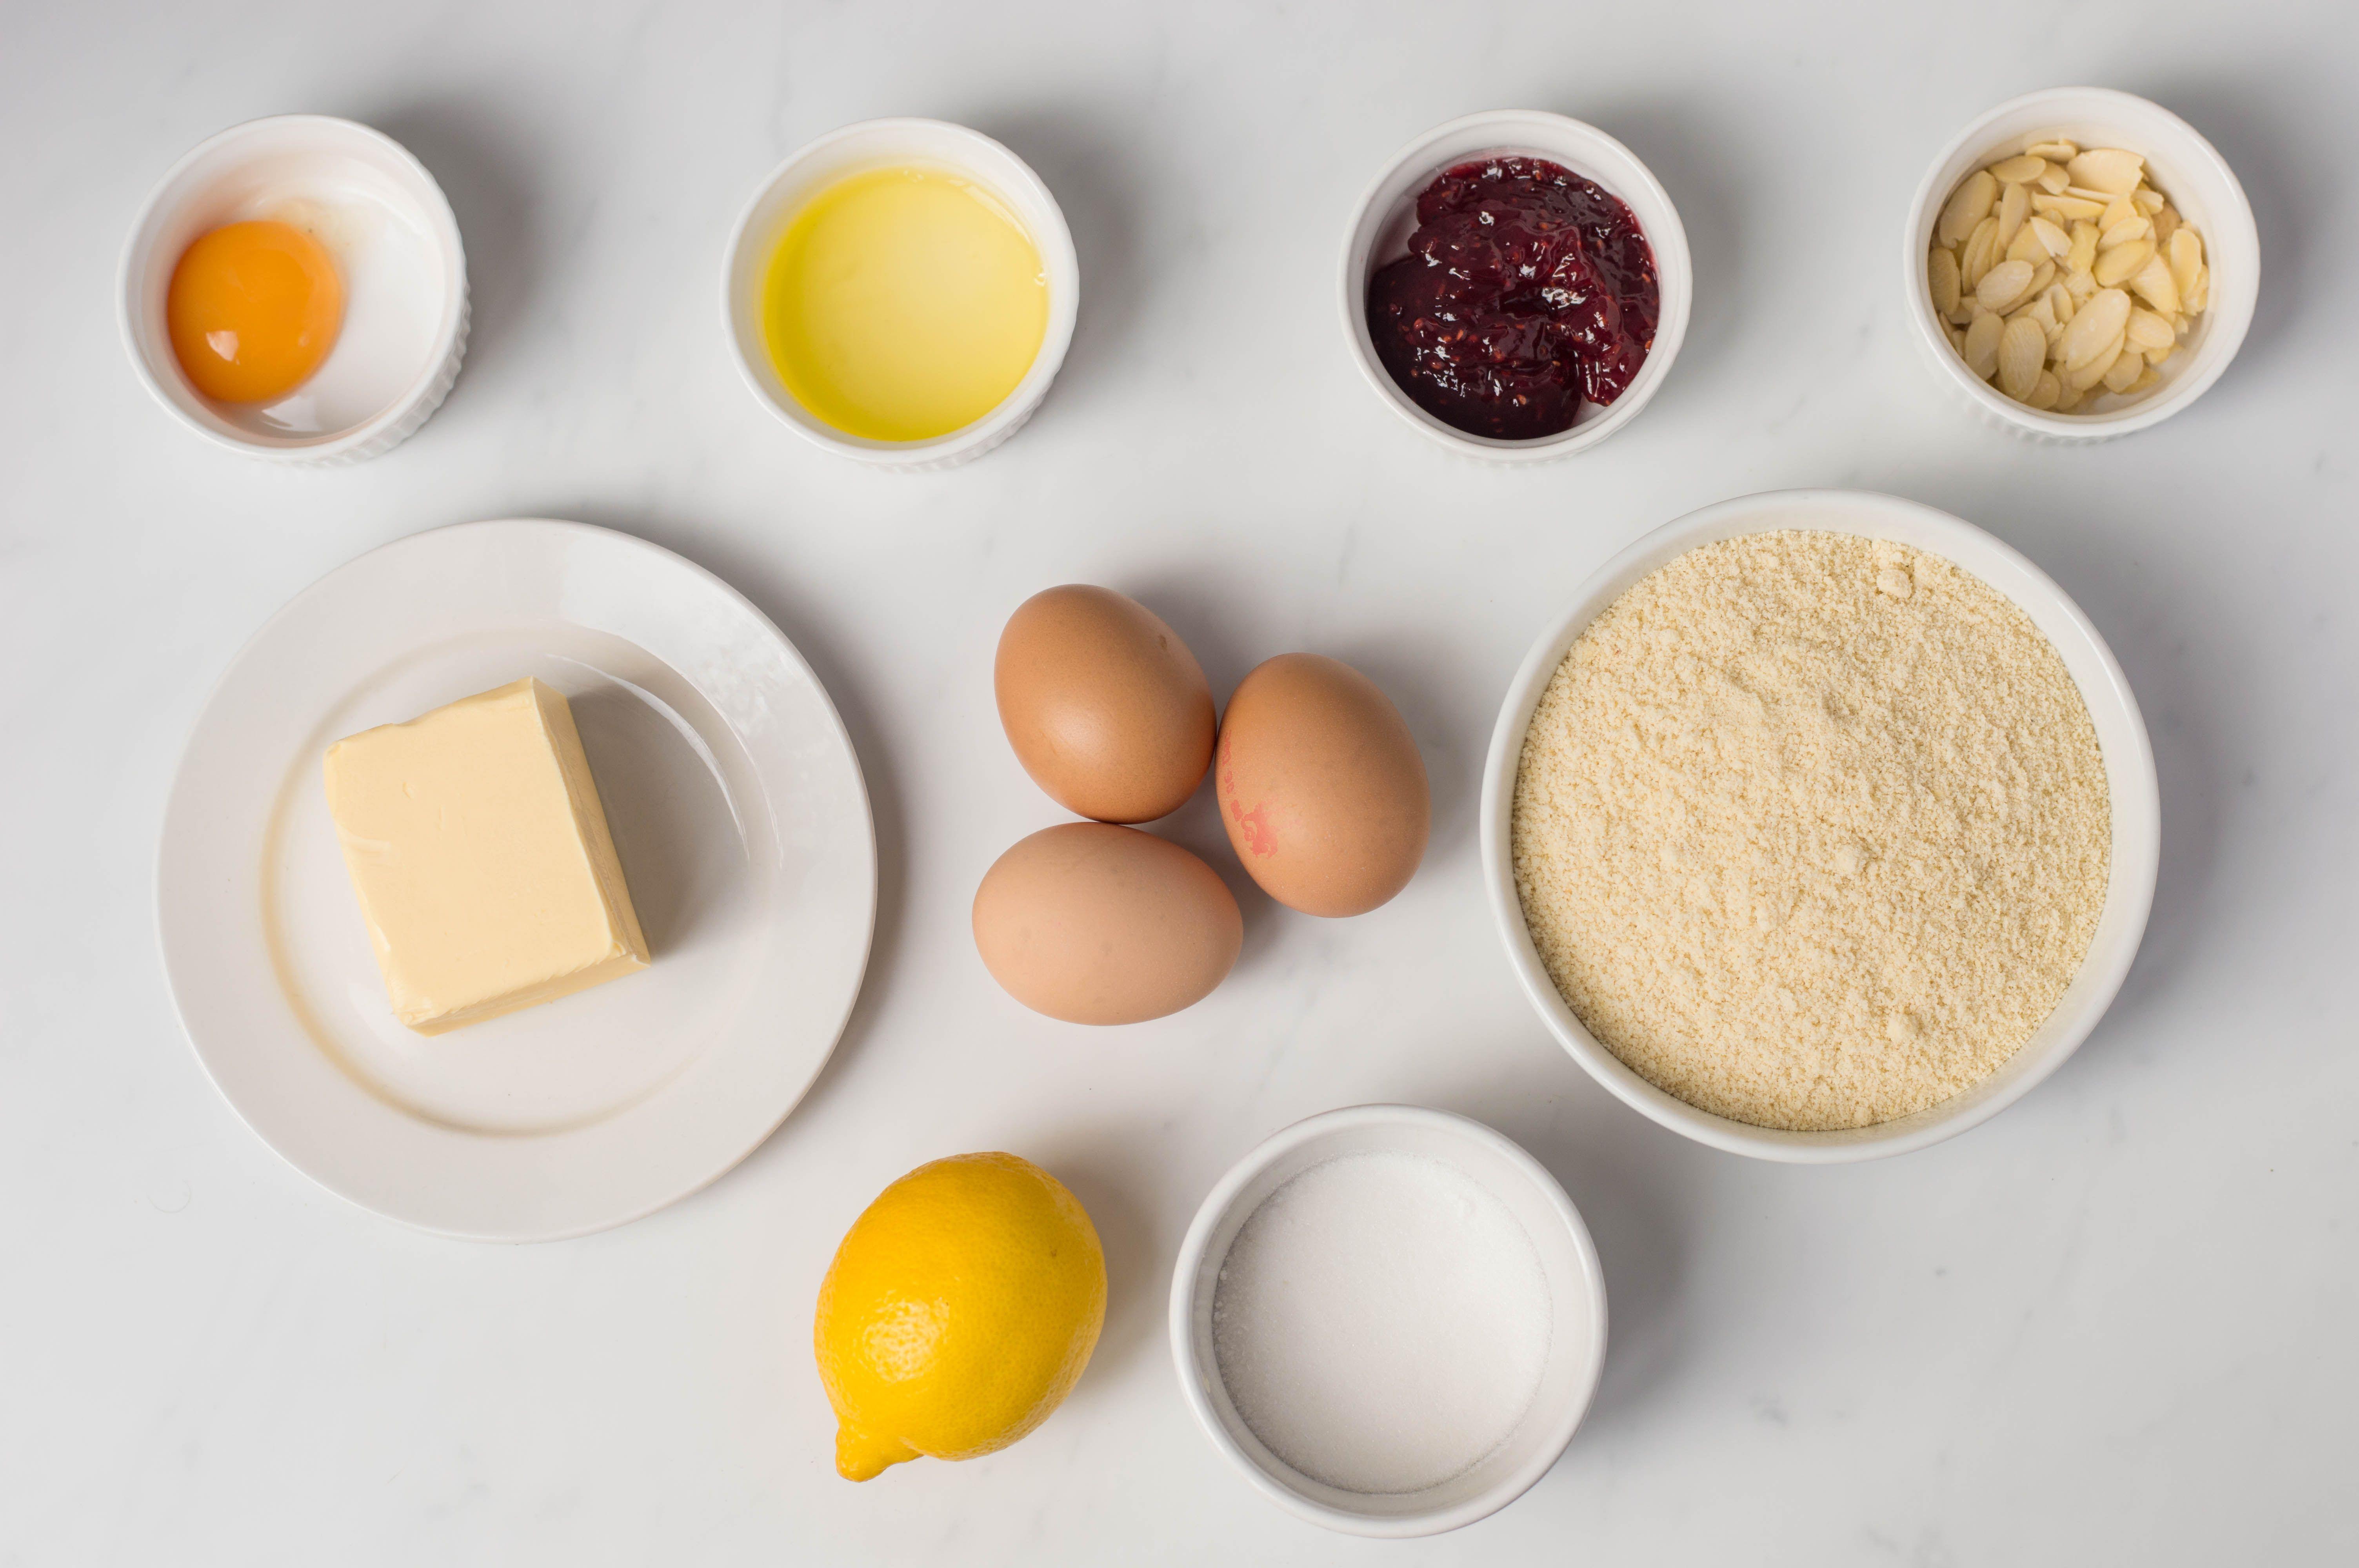 Ingredients for tart filling